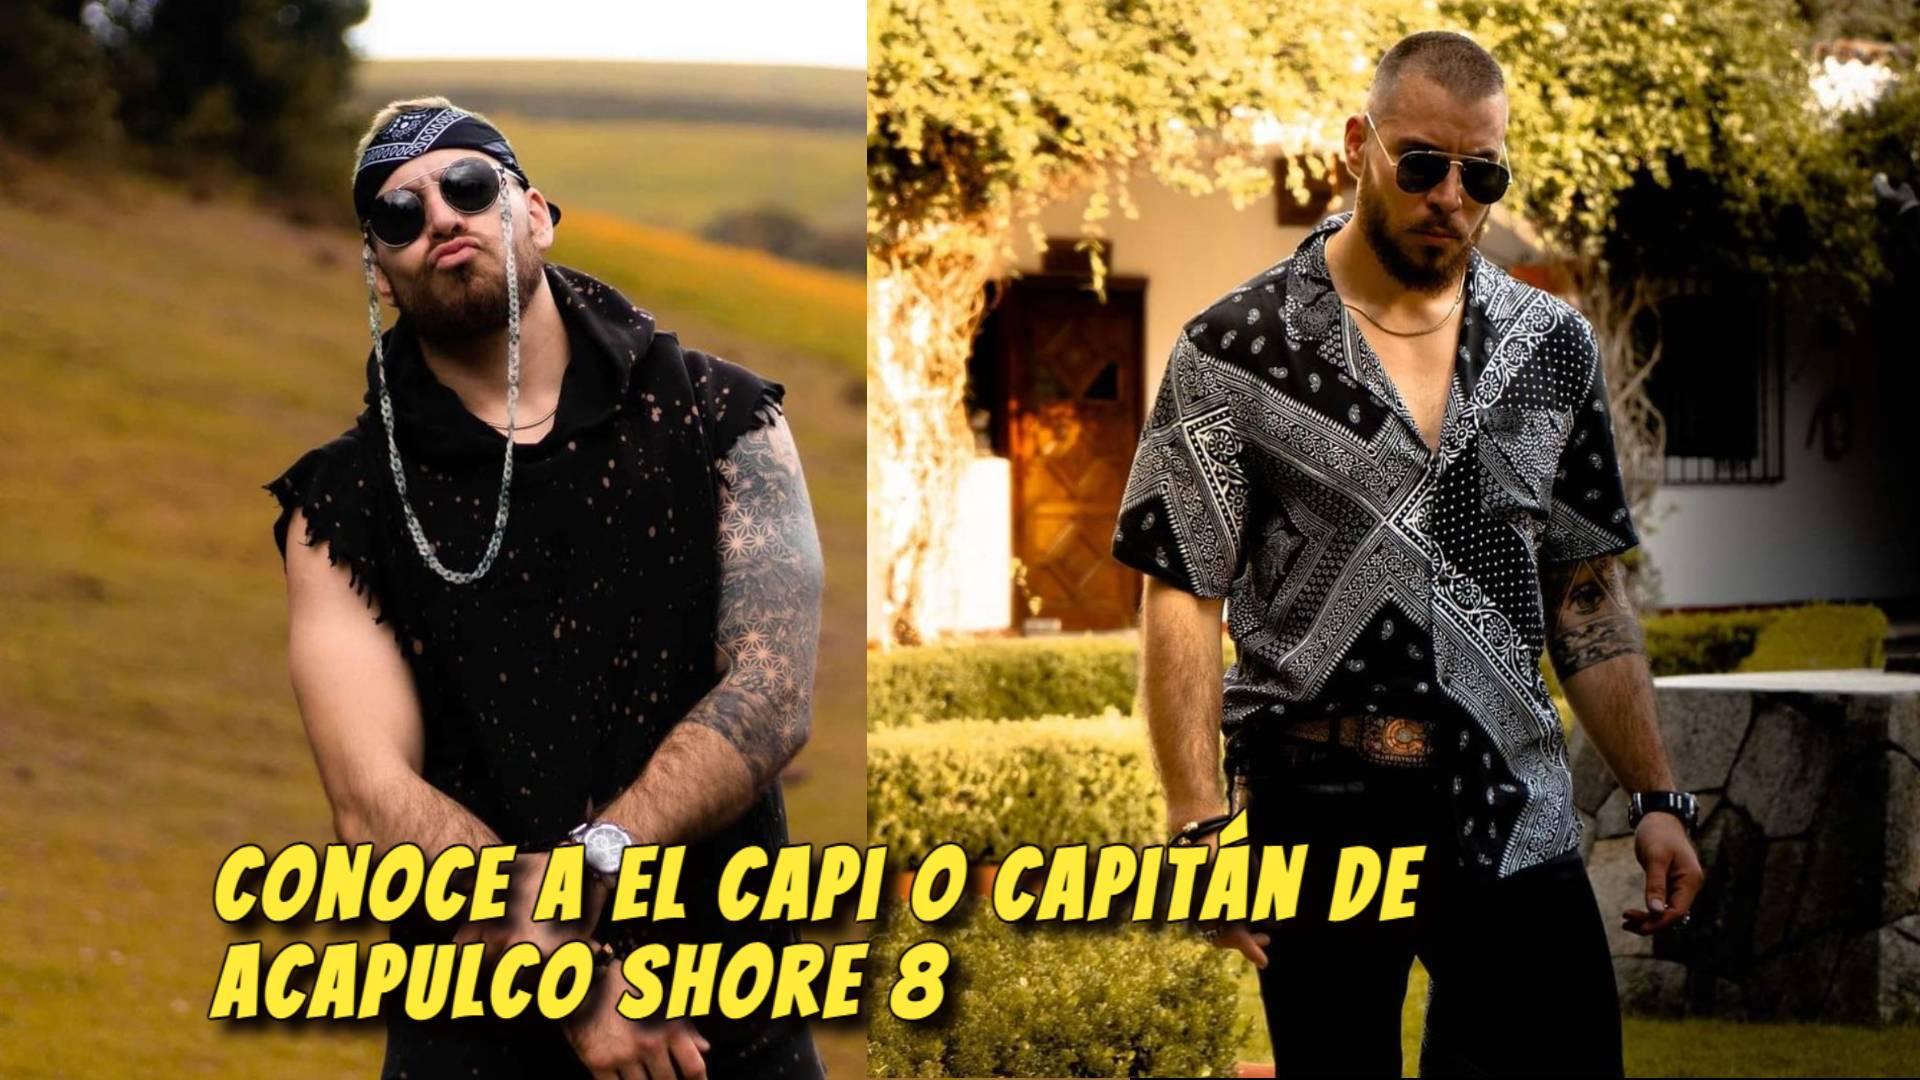 Conoce a El Capi o Capitán de Acapulco Shore 8